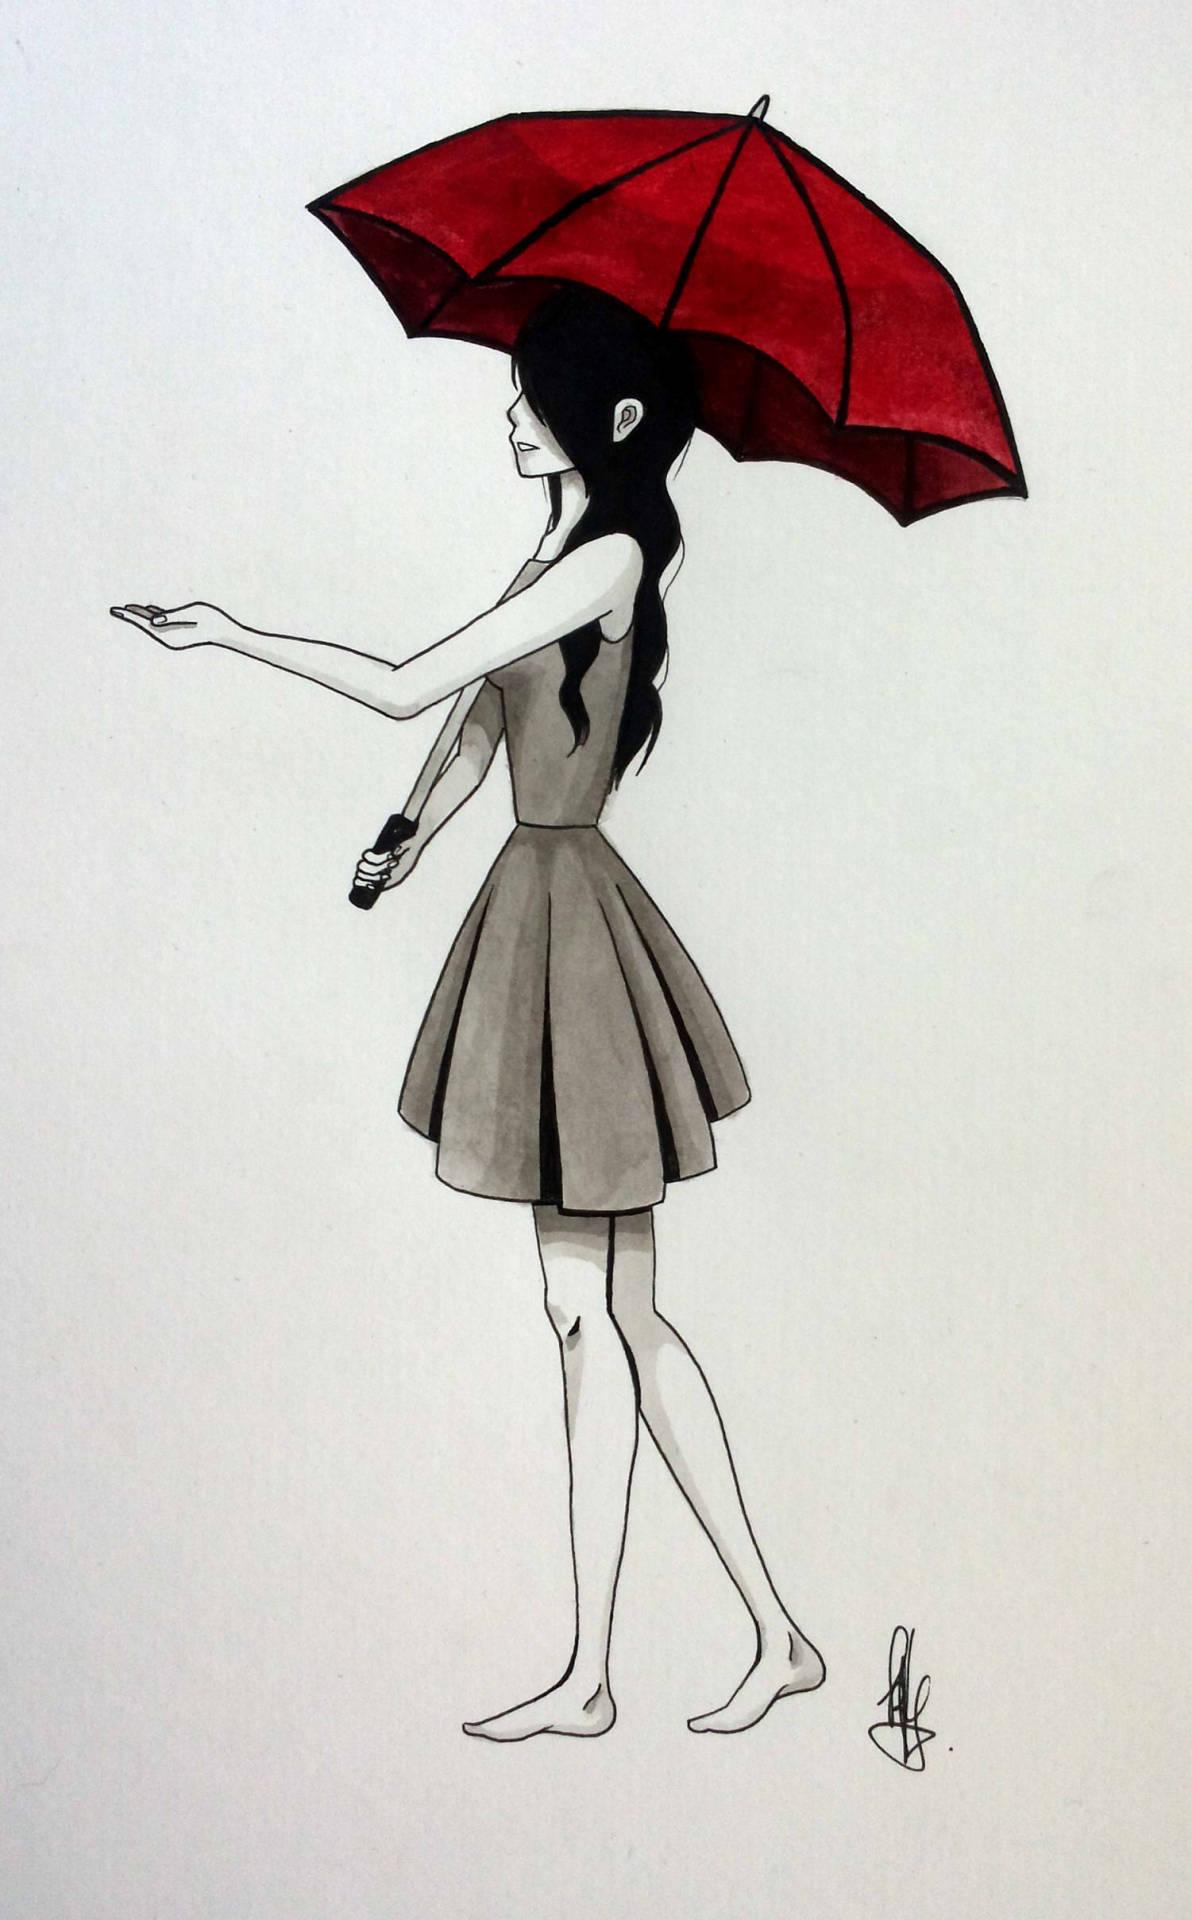 1192x1920 The Red Umbrella A Mayday Parade Inspired Drawing